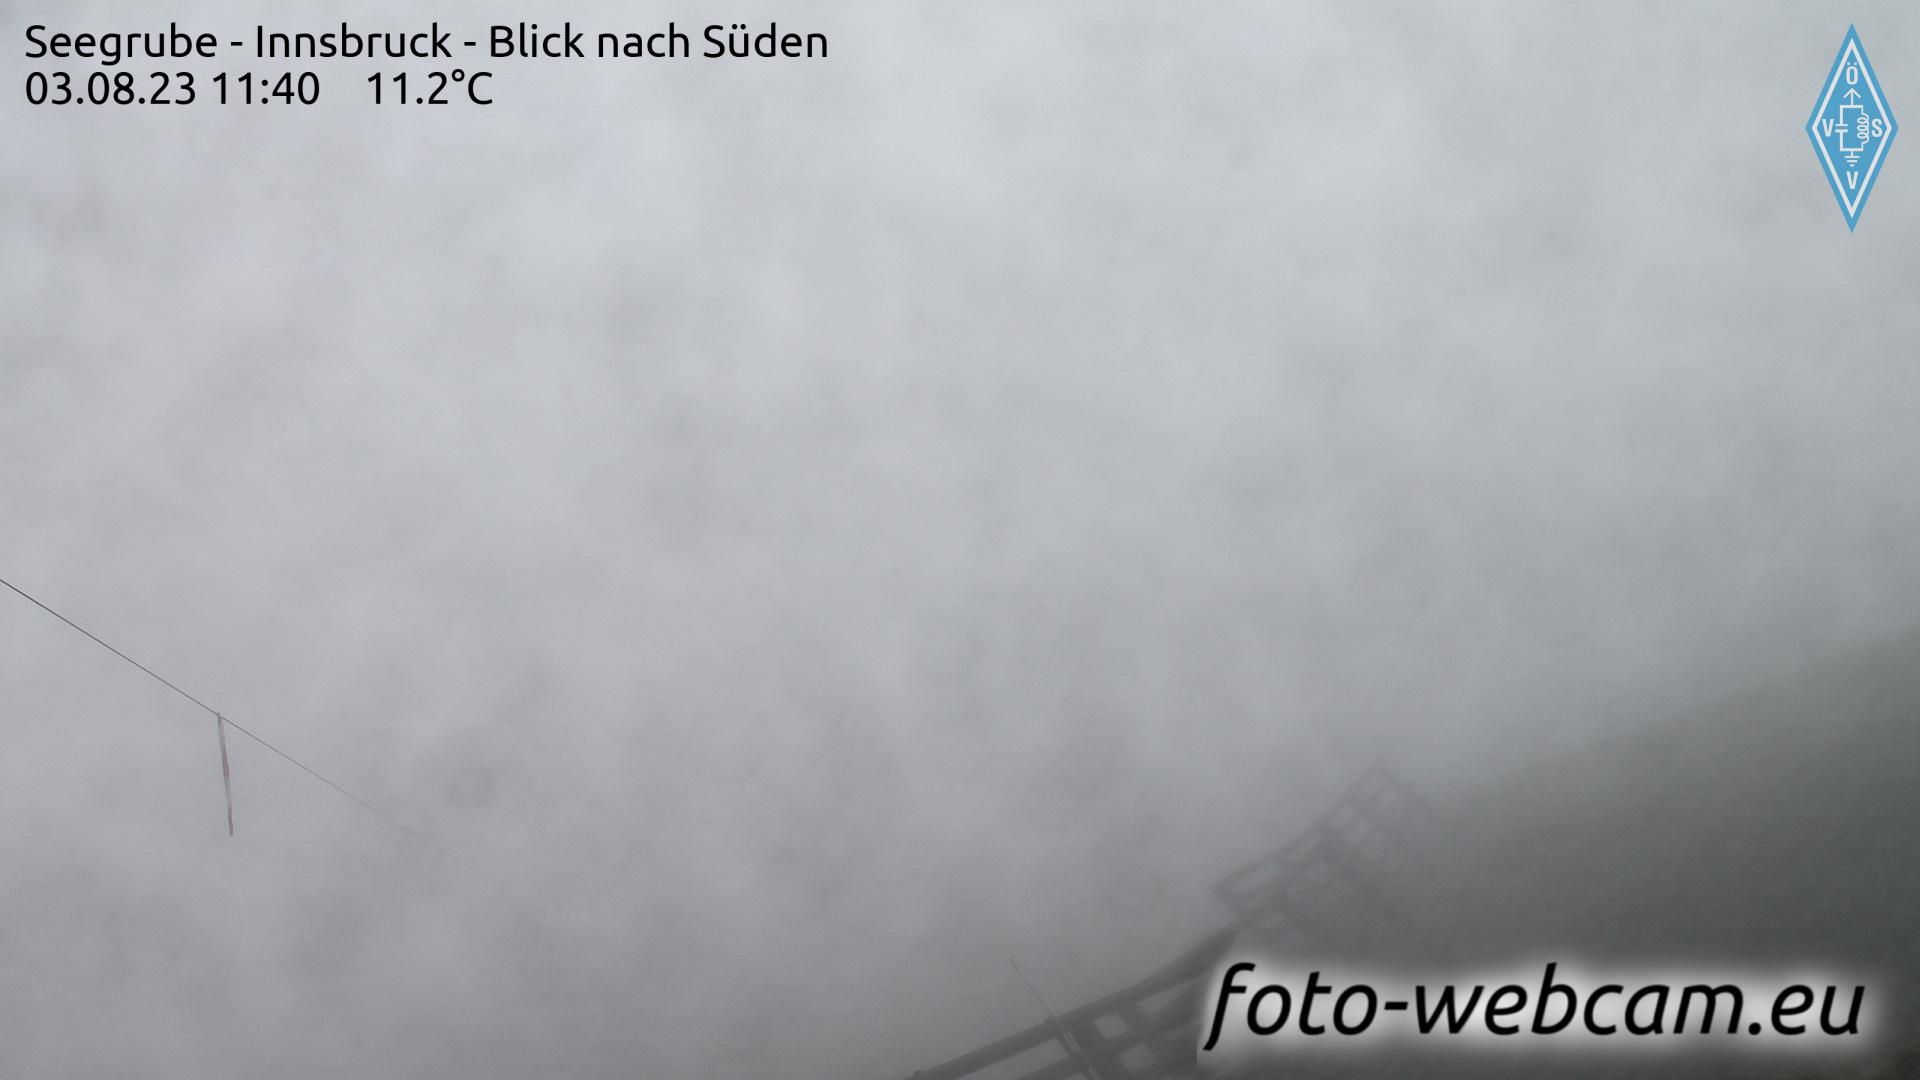 Innsbruck Wed. 11:18